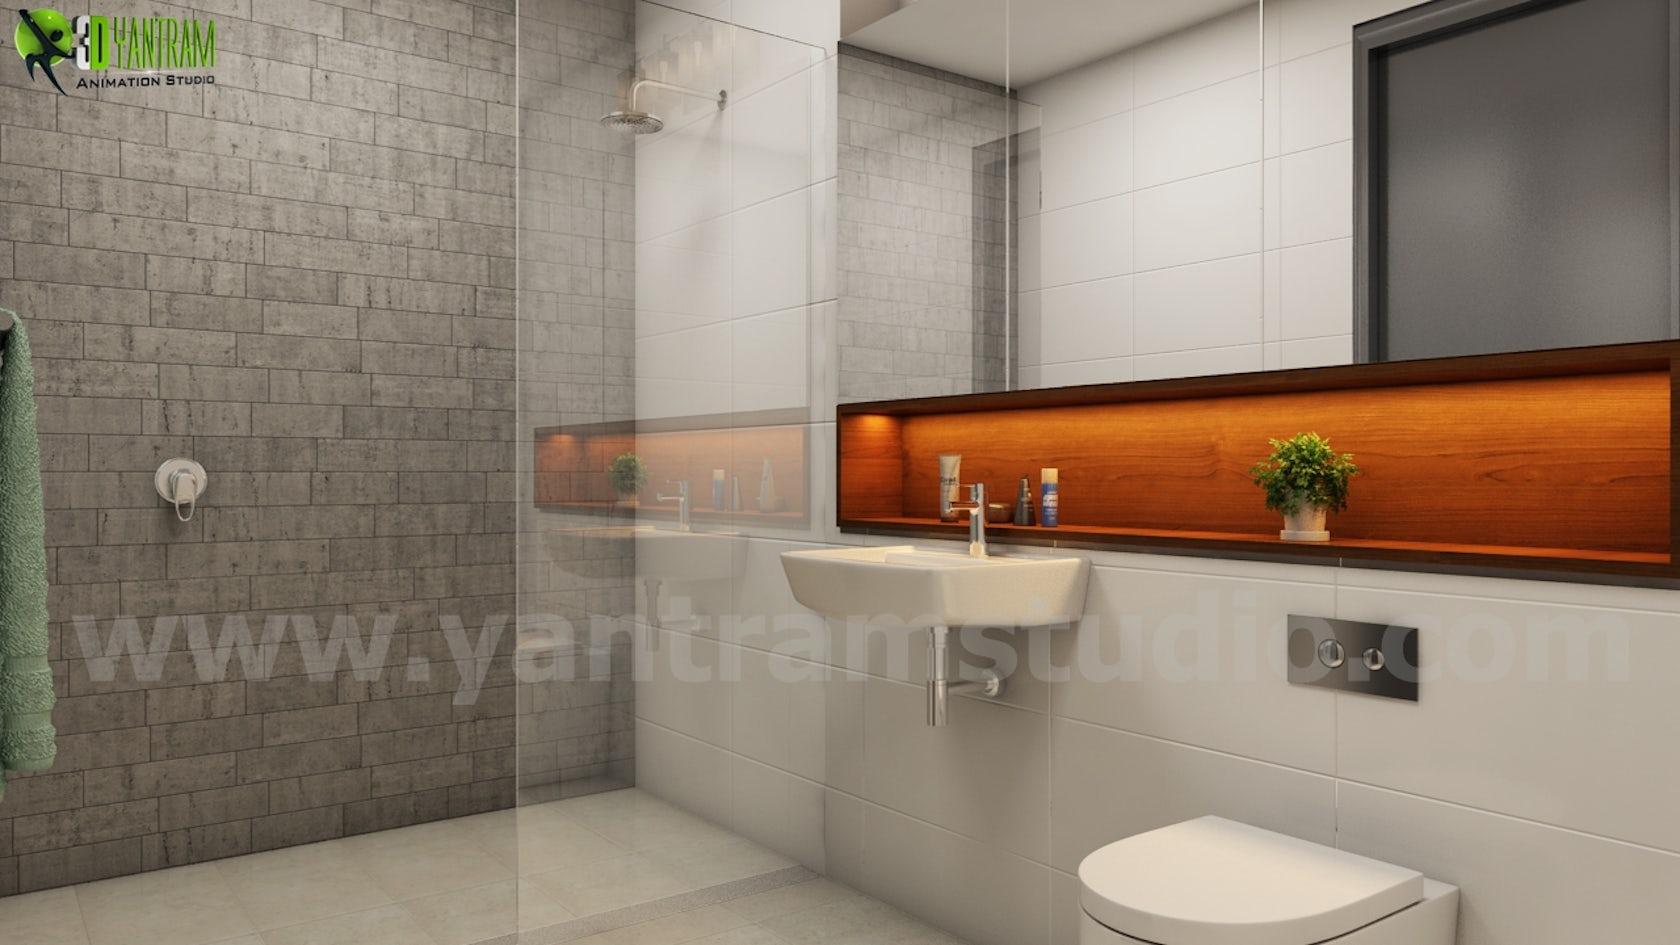 Interior design firms architizer for Residential interior design firms nyc